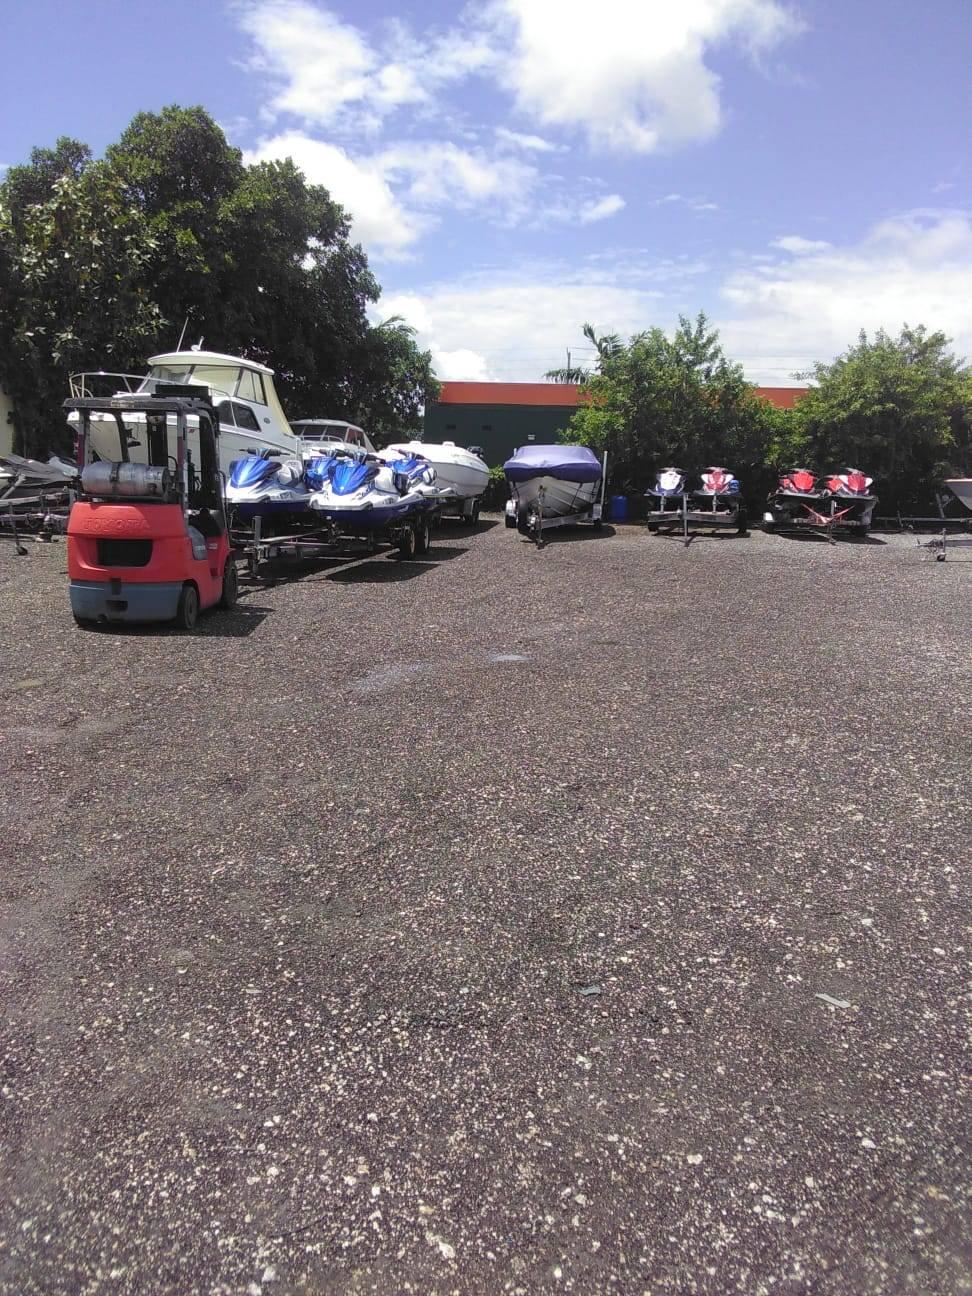 Offshore Boat & Jet-ski Storage - storage  | Photo 9 of 9 | Address: 810 NW 72nd St, Miami, FL 33150, USA | Phone: (786) 789-1051